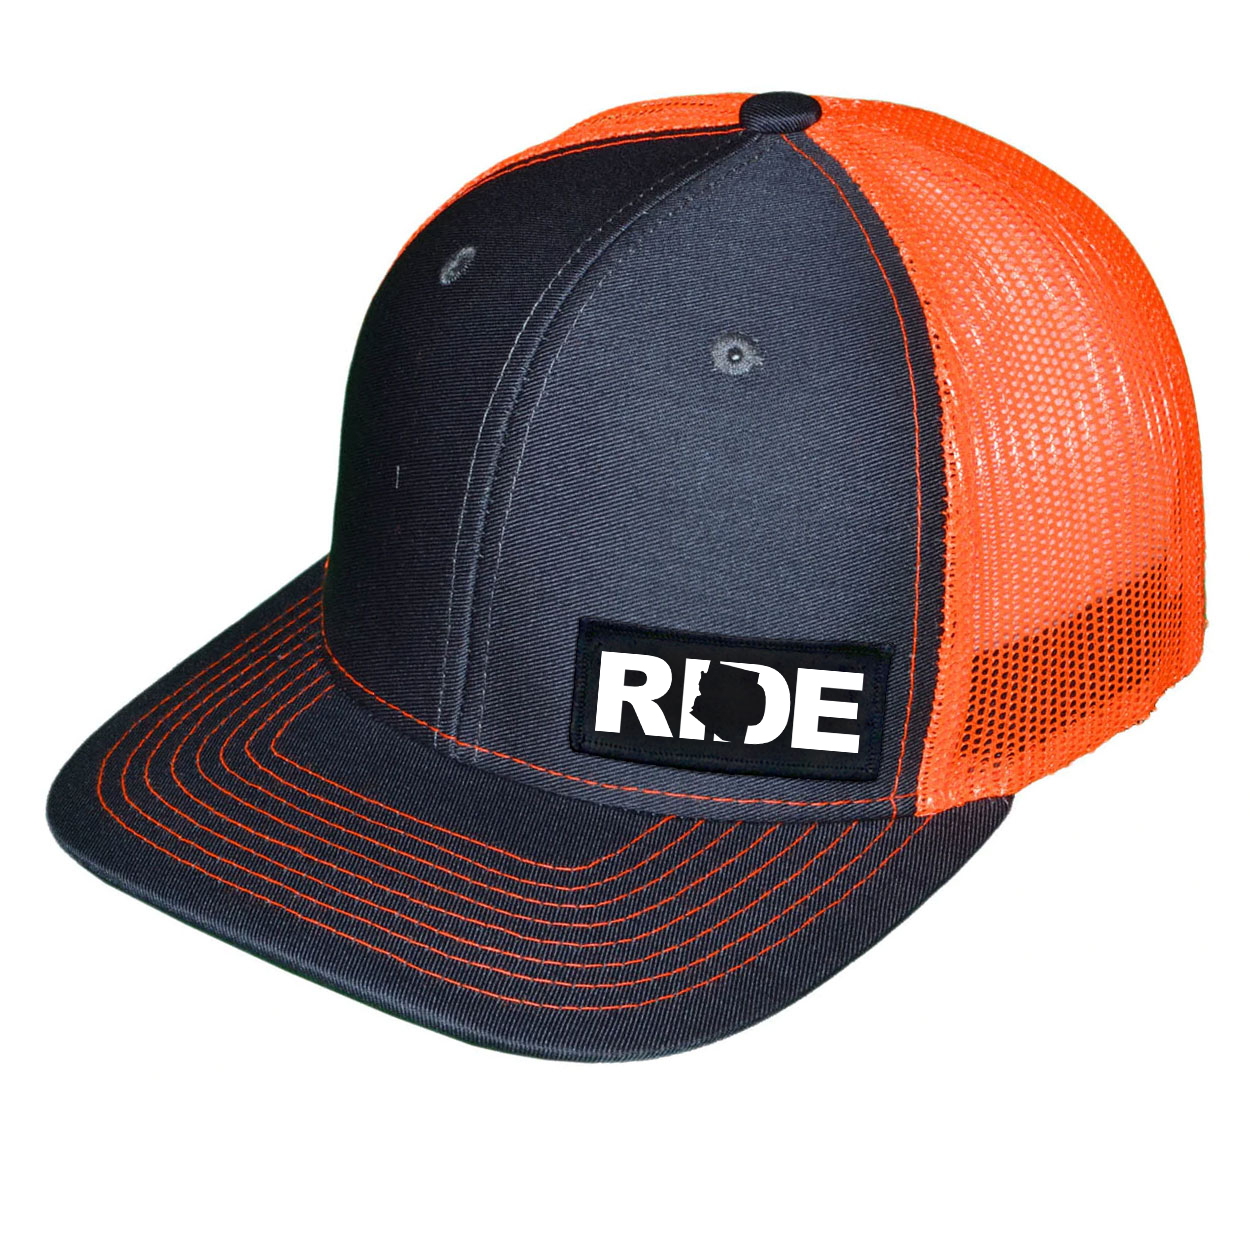 Ride Arizona Night Out Woven Patch Snapback Trucker Hat Dark Gray/Orange (White Logo)